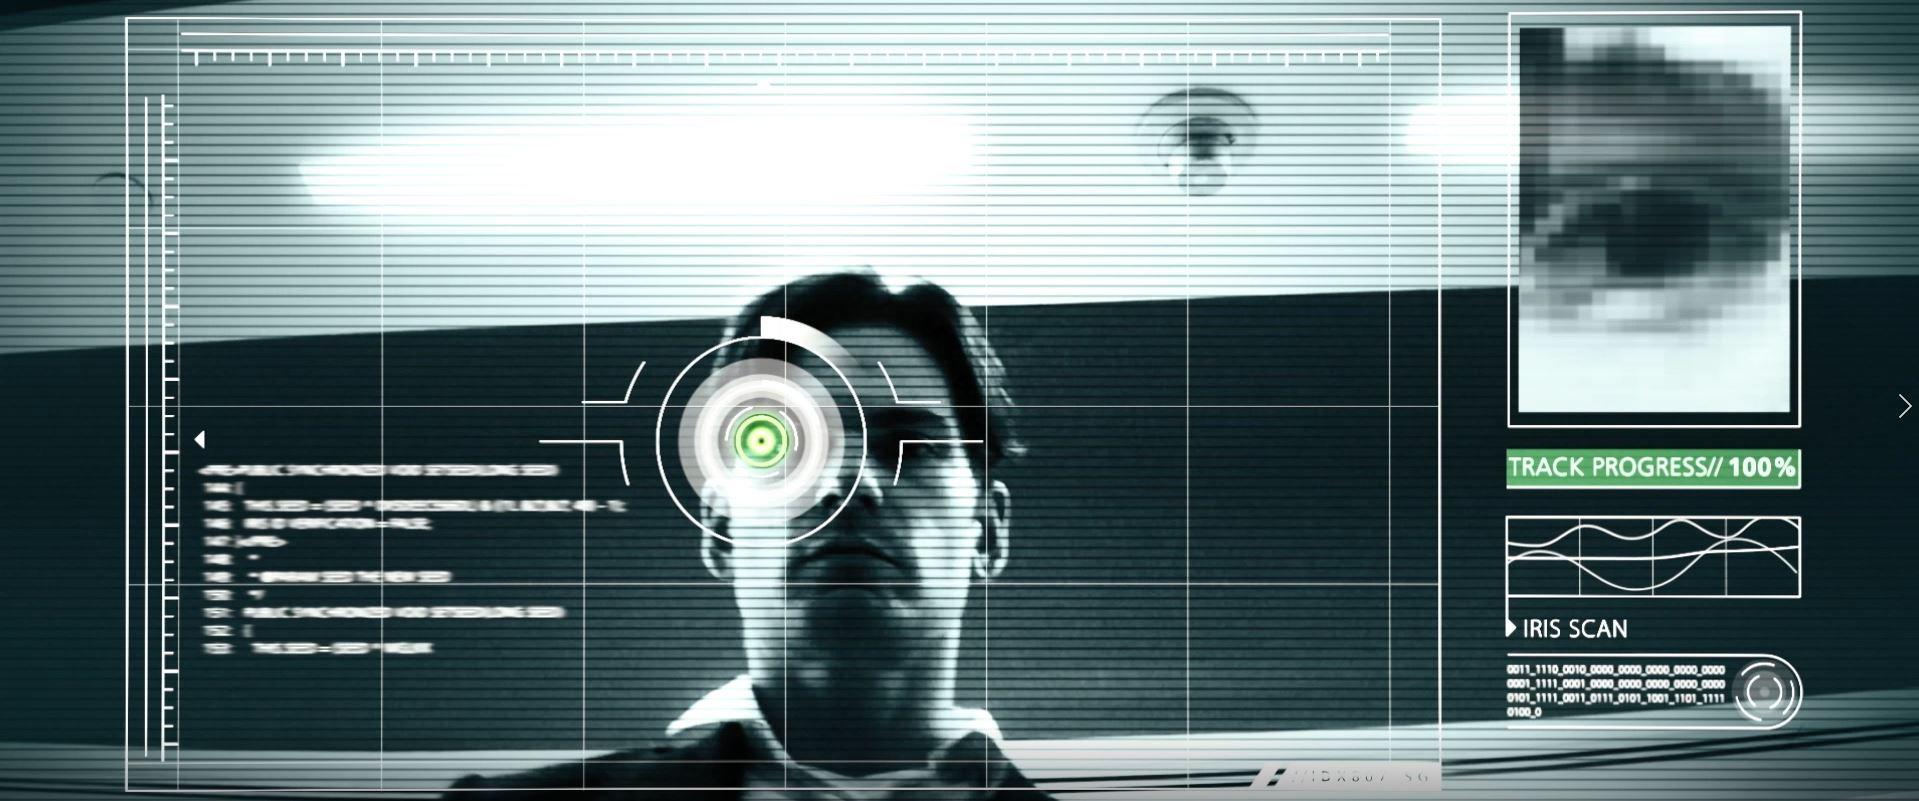 Securing identities with biometrics - Veridos Identity Solutions